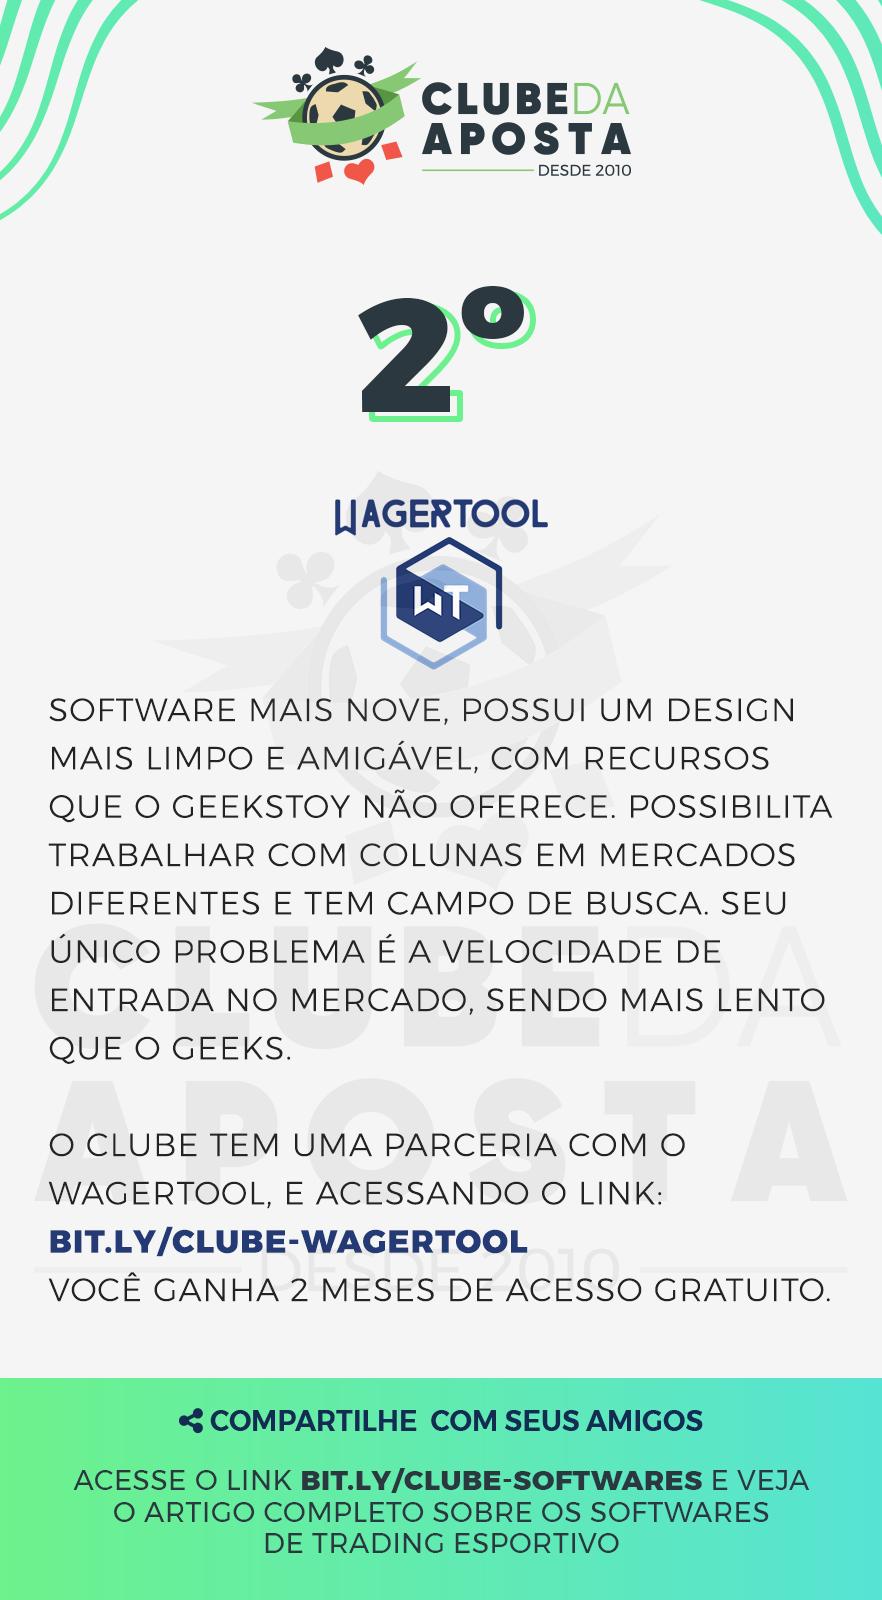 02-os-3-principais-softwares-de-trading-esportivo